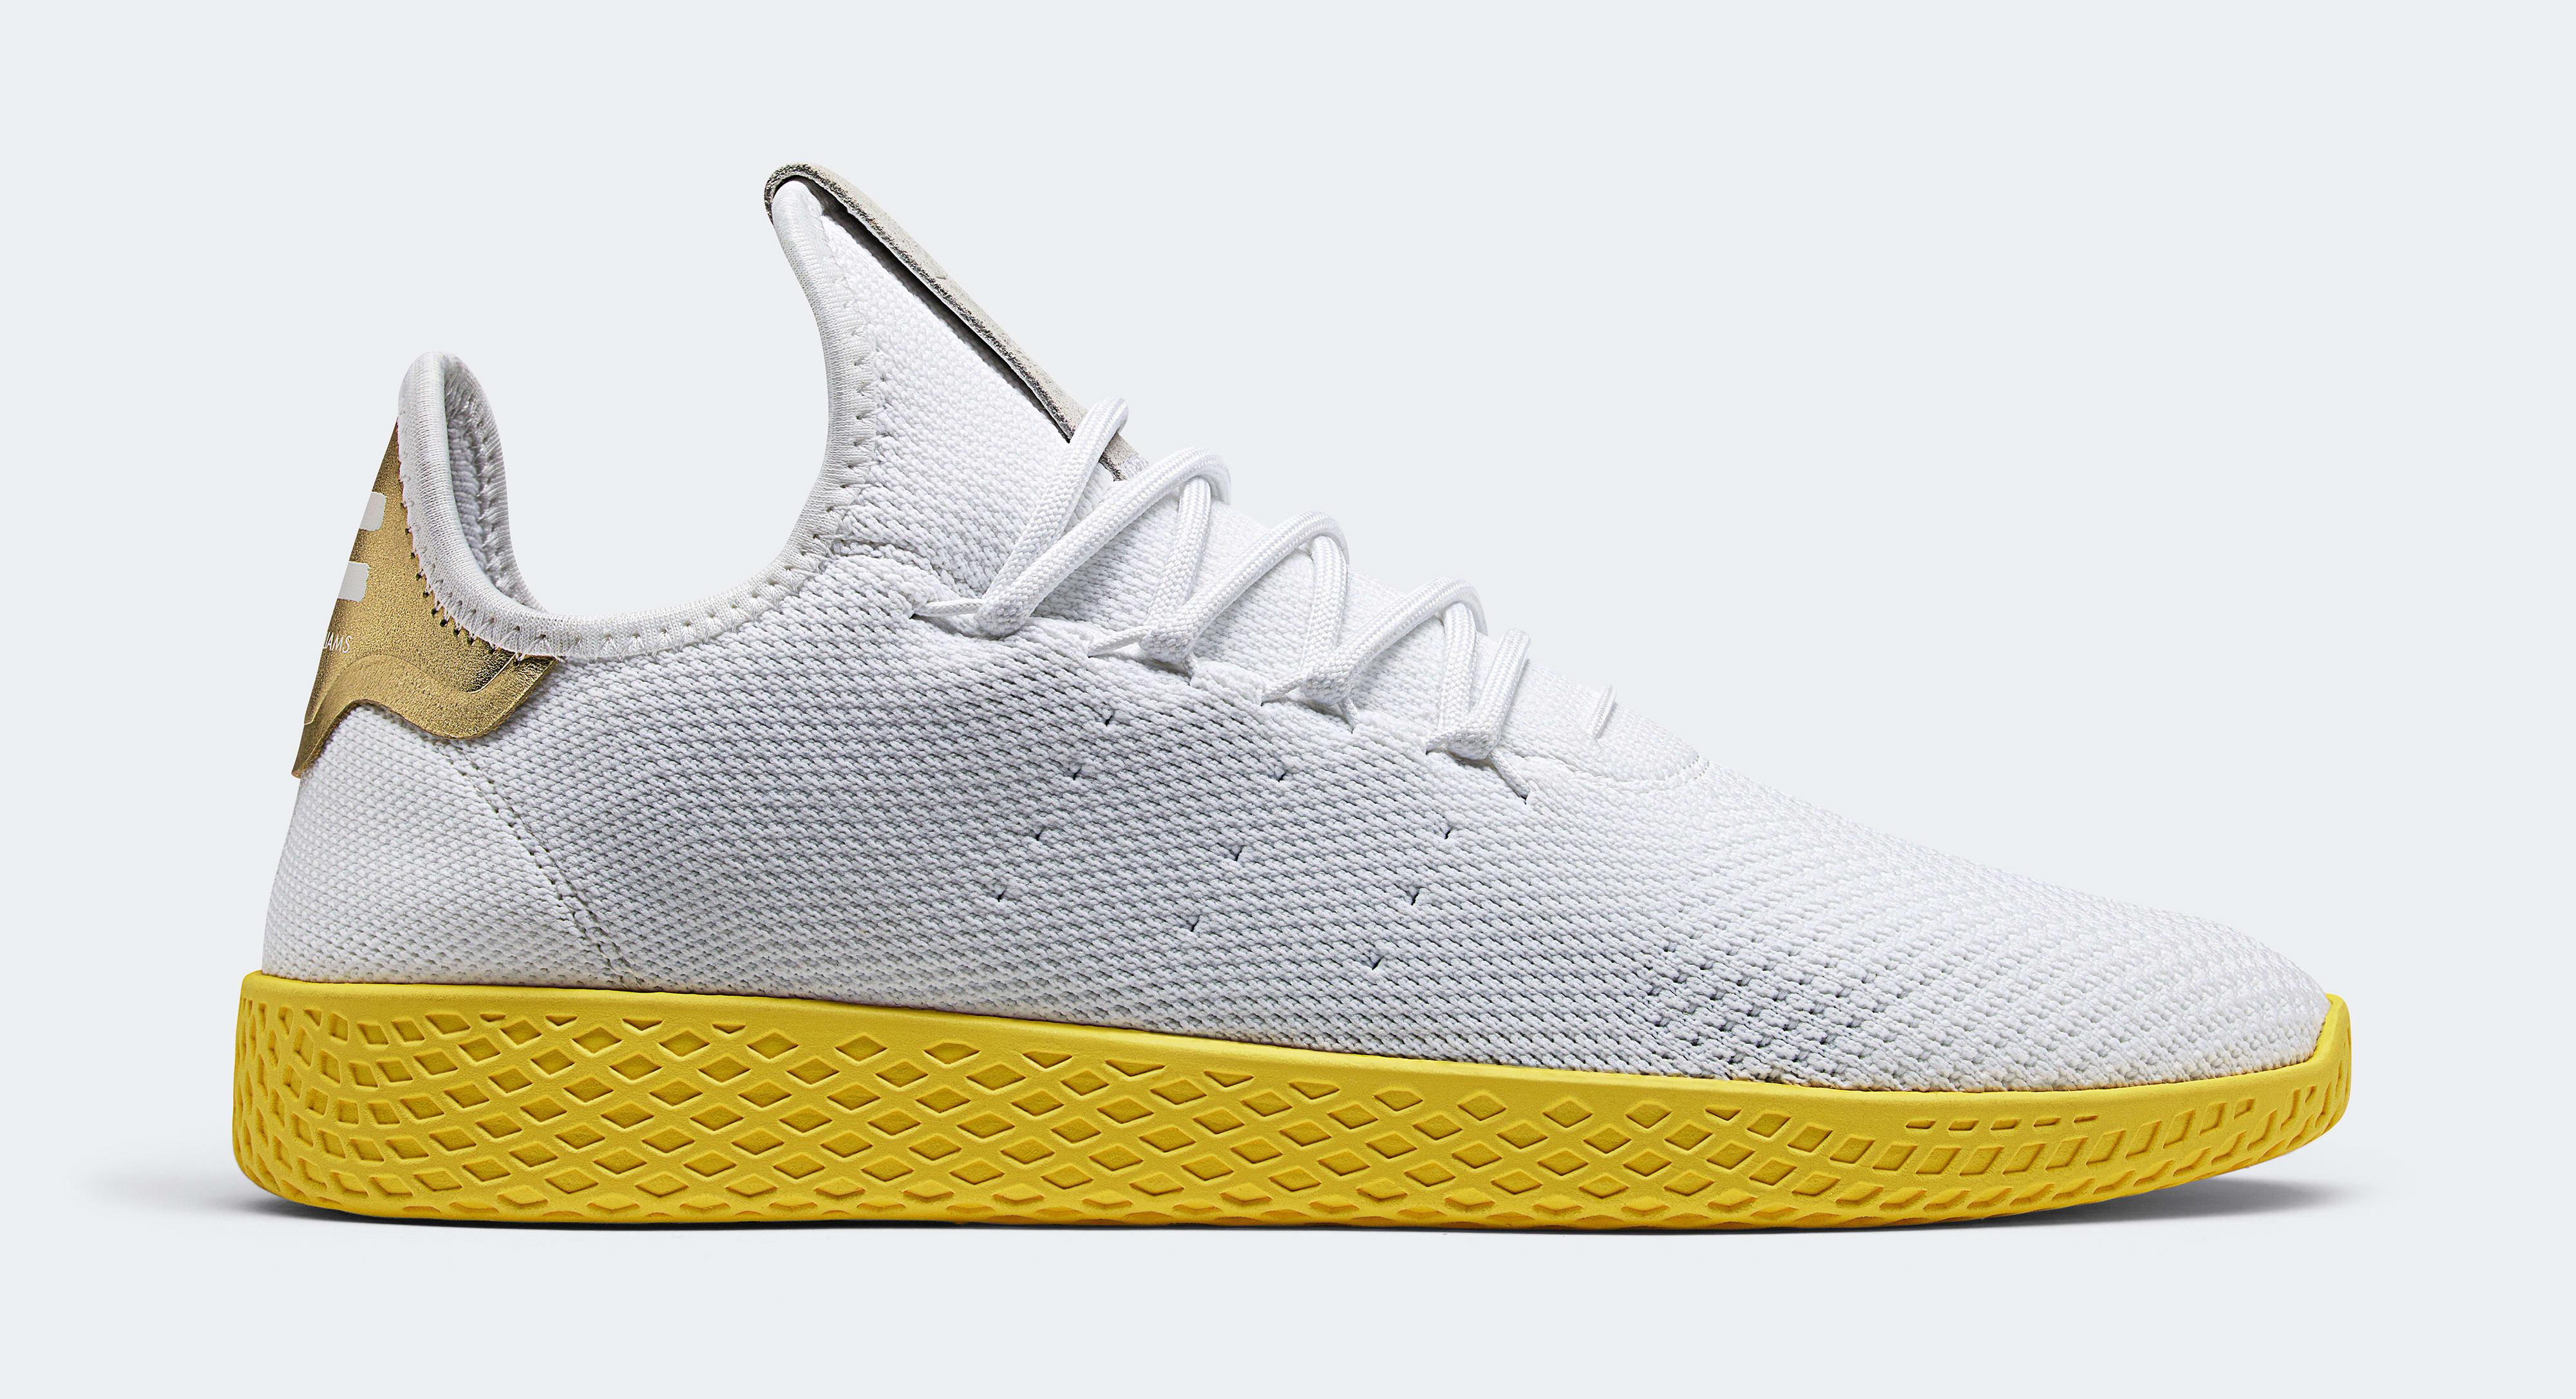 First Adidas Tennis Shoe